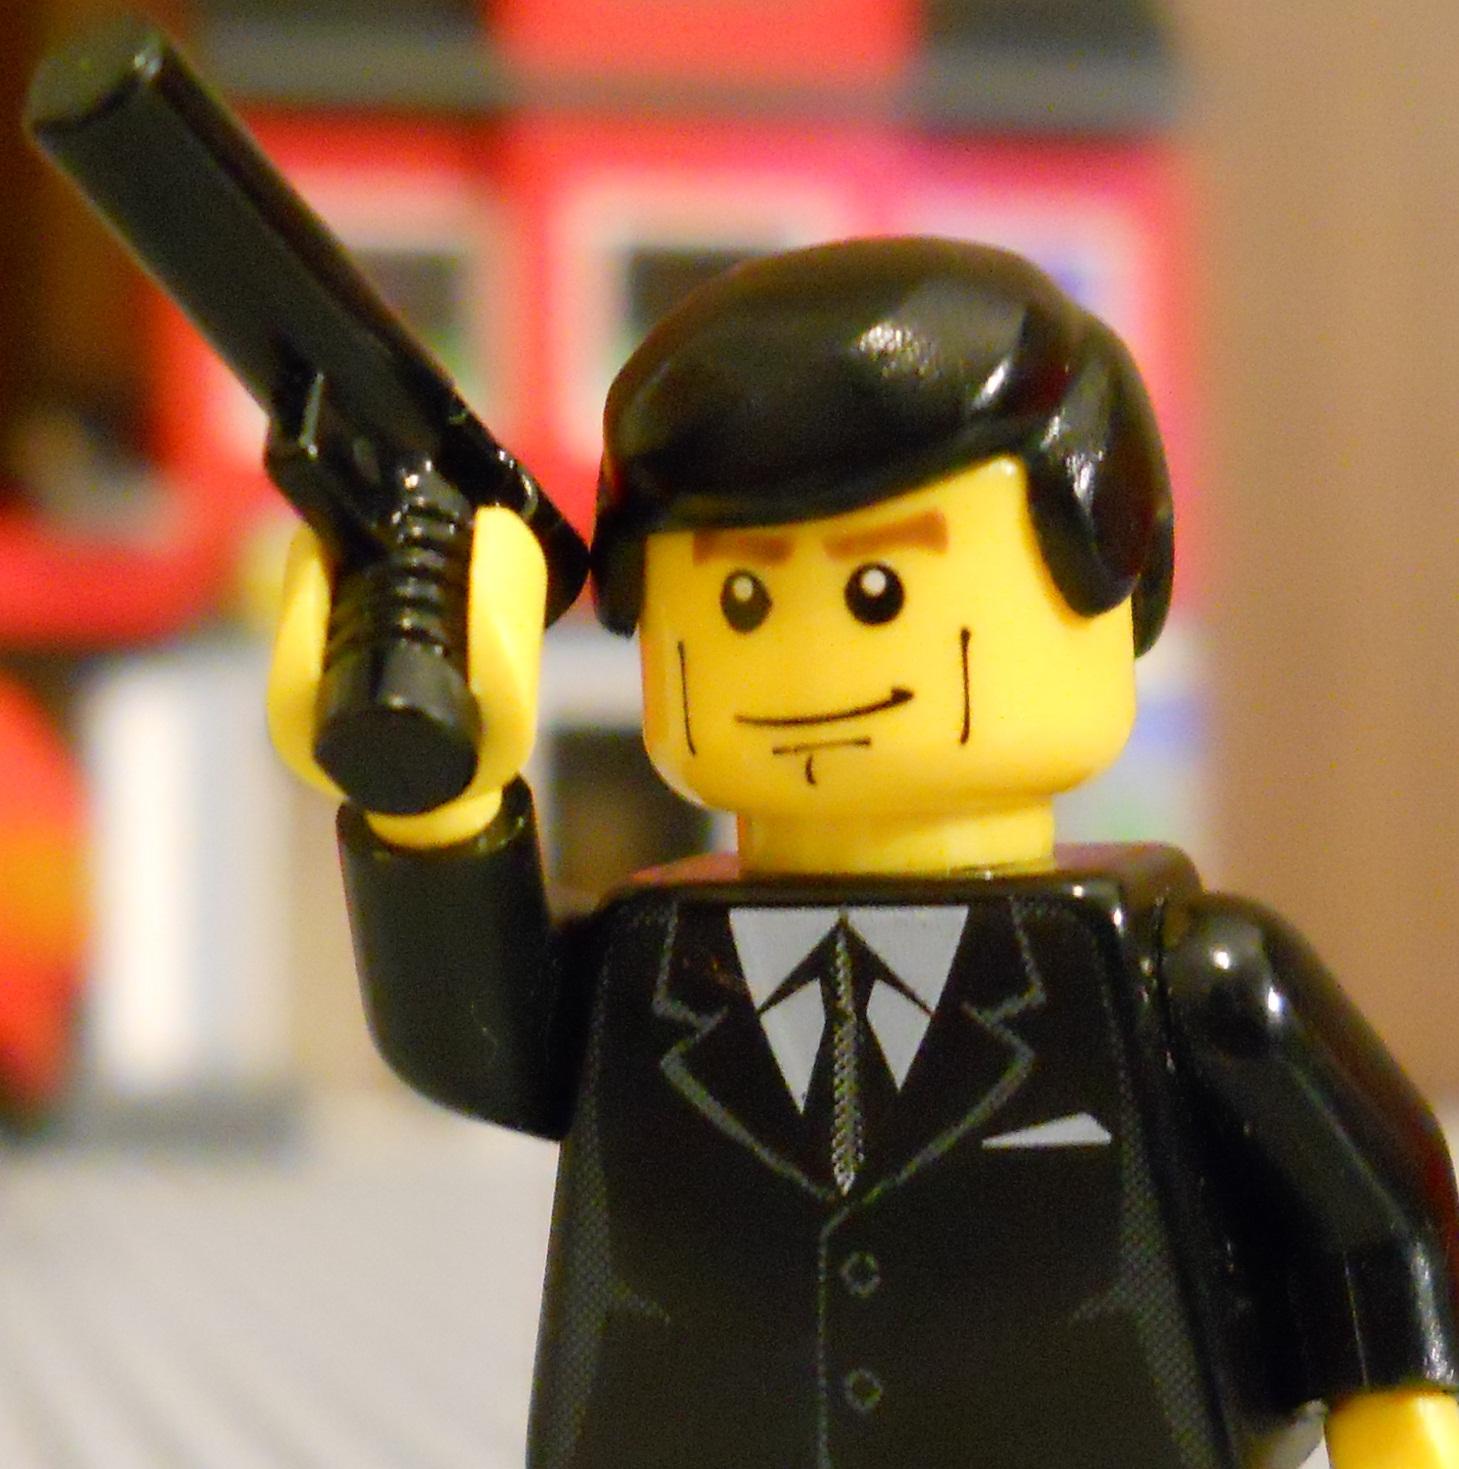 category lego james bond lego brickfilm wiki fandom. Black Bedroom Furniture Sets. Home Design Ideas